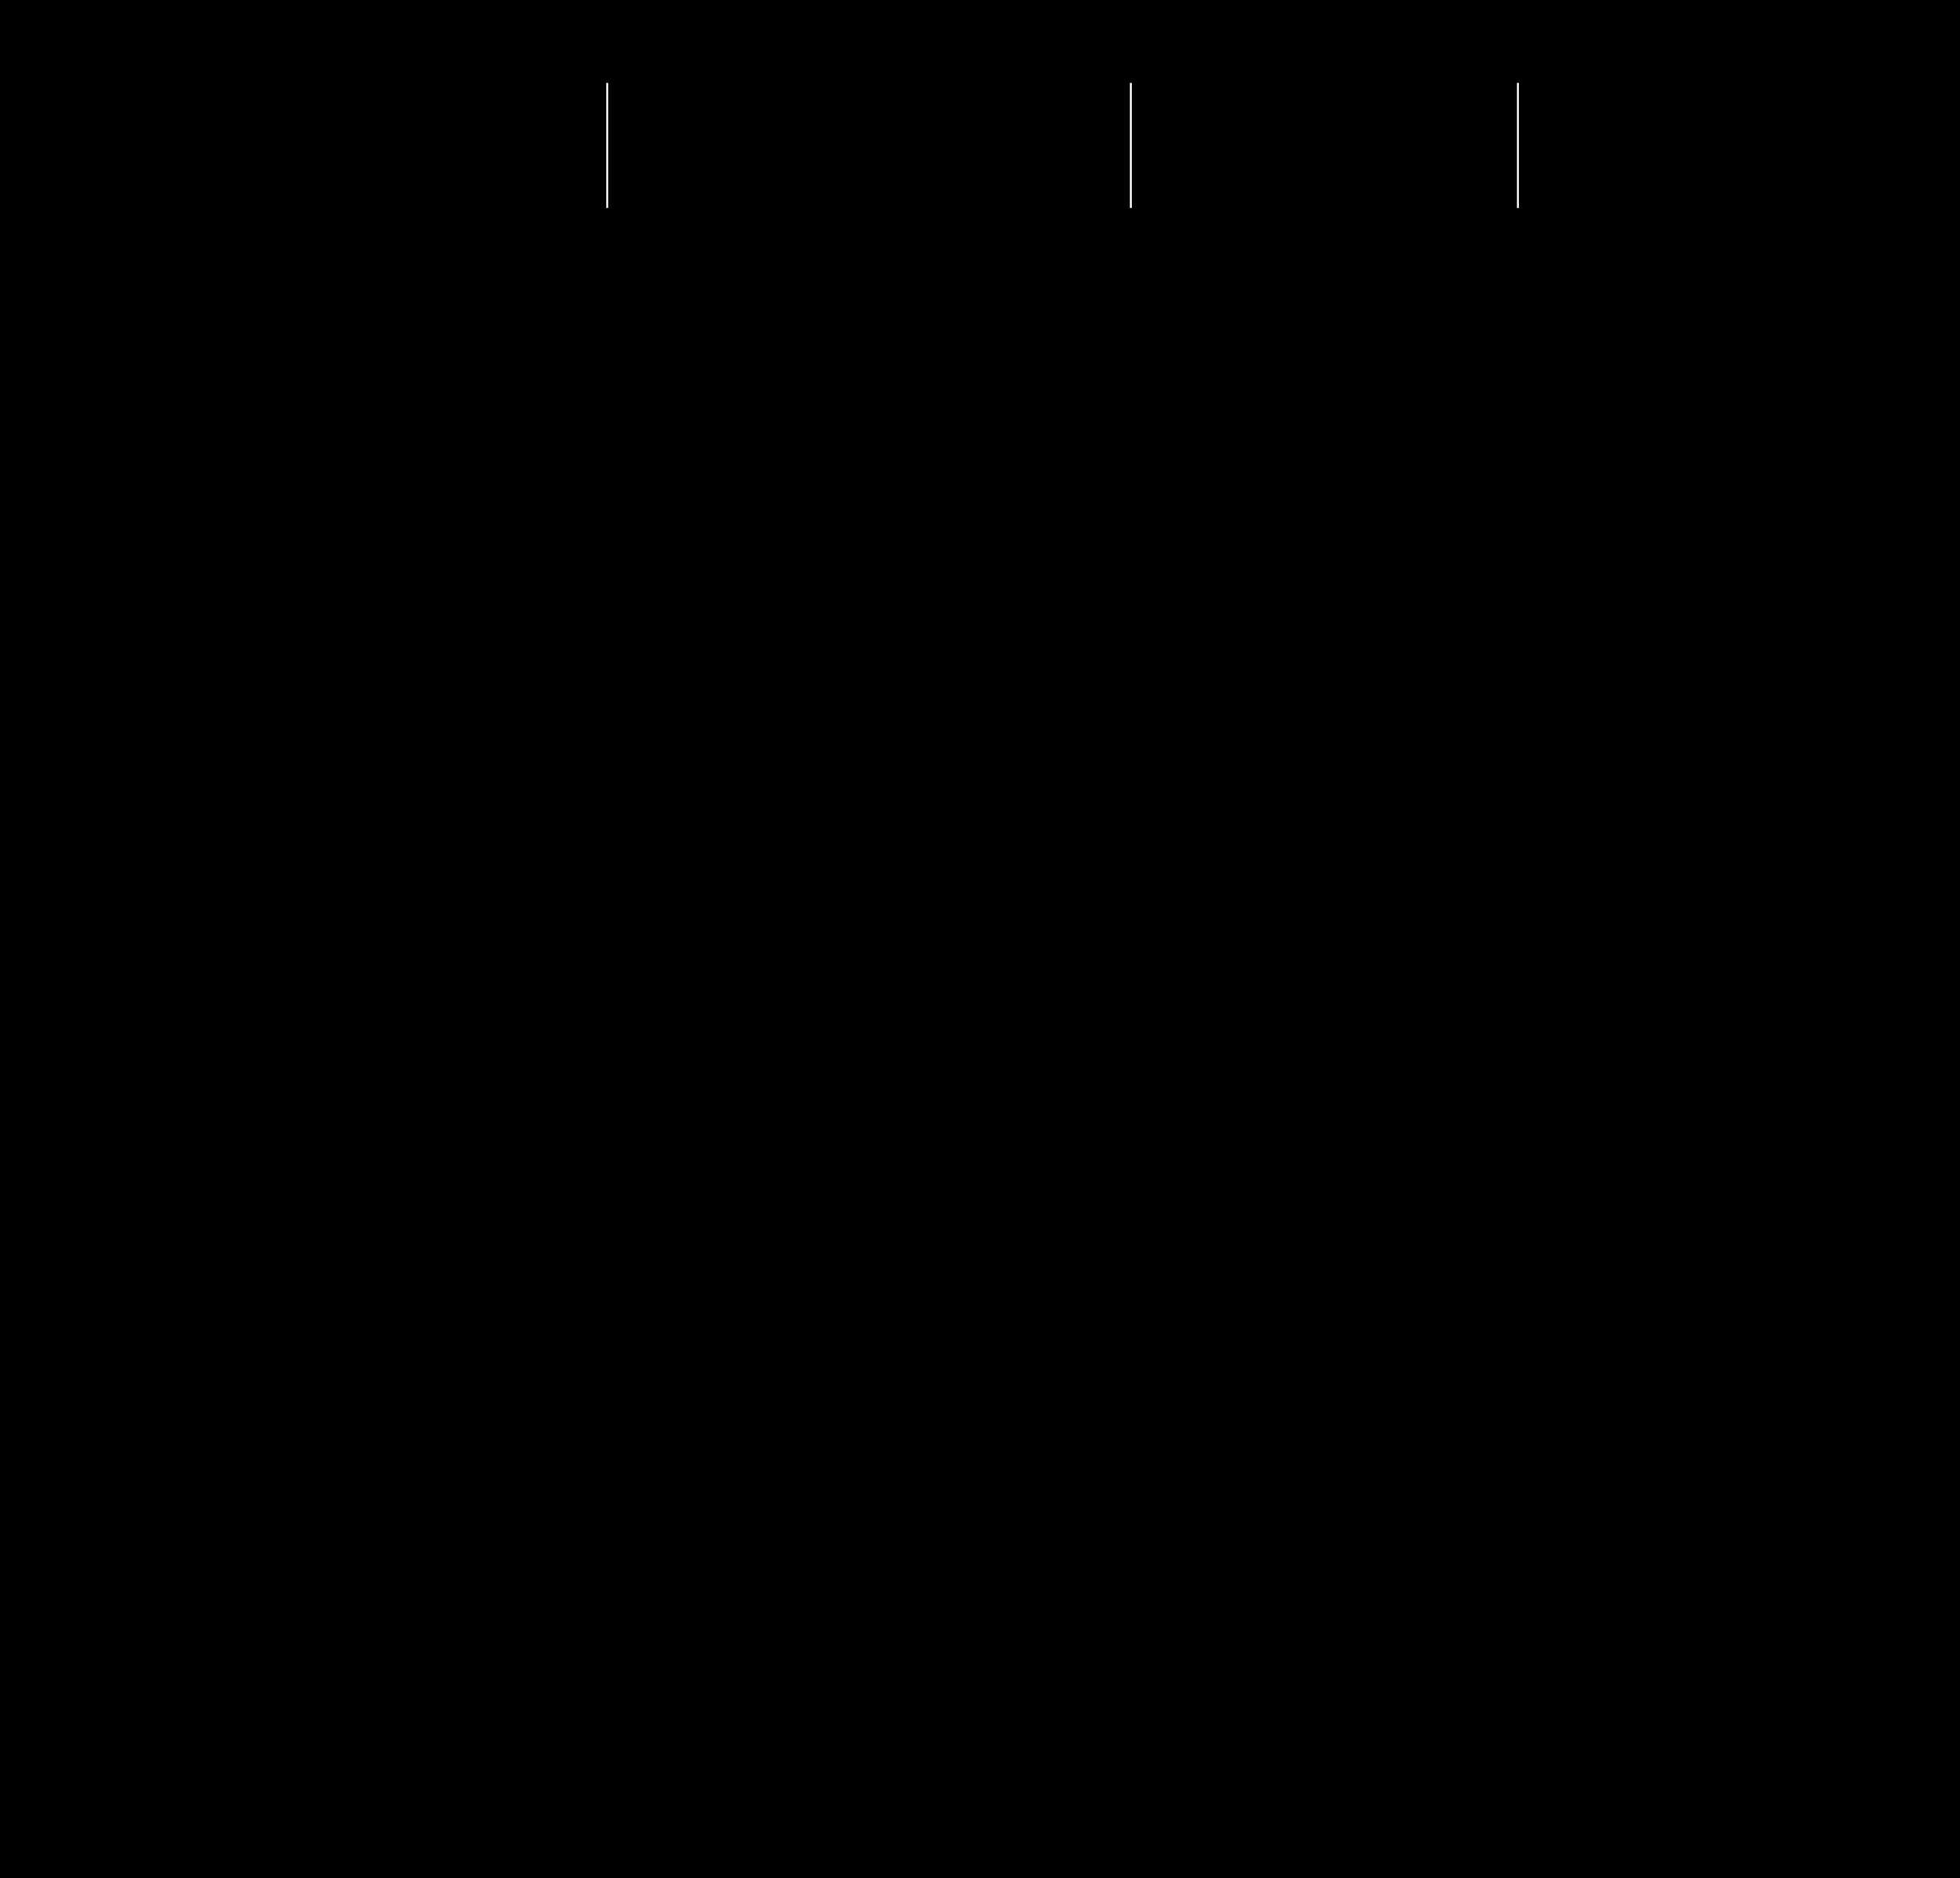 2400x2300 Sample Spreadsheet Clip Art Cliparts